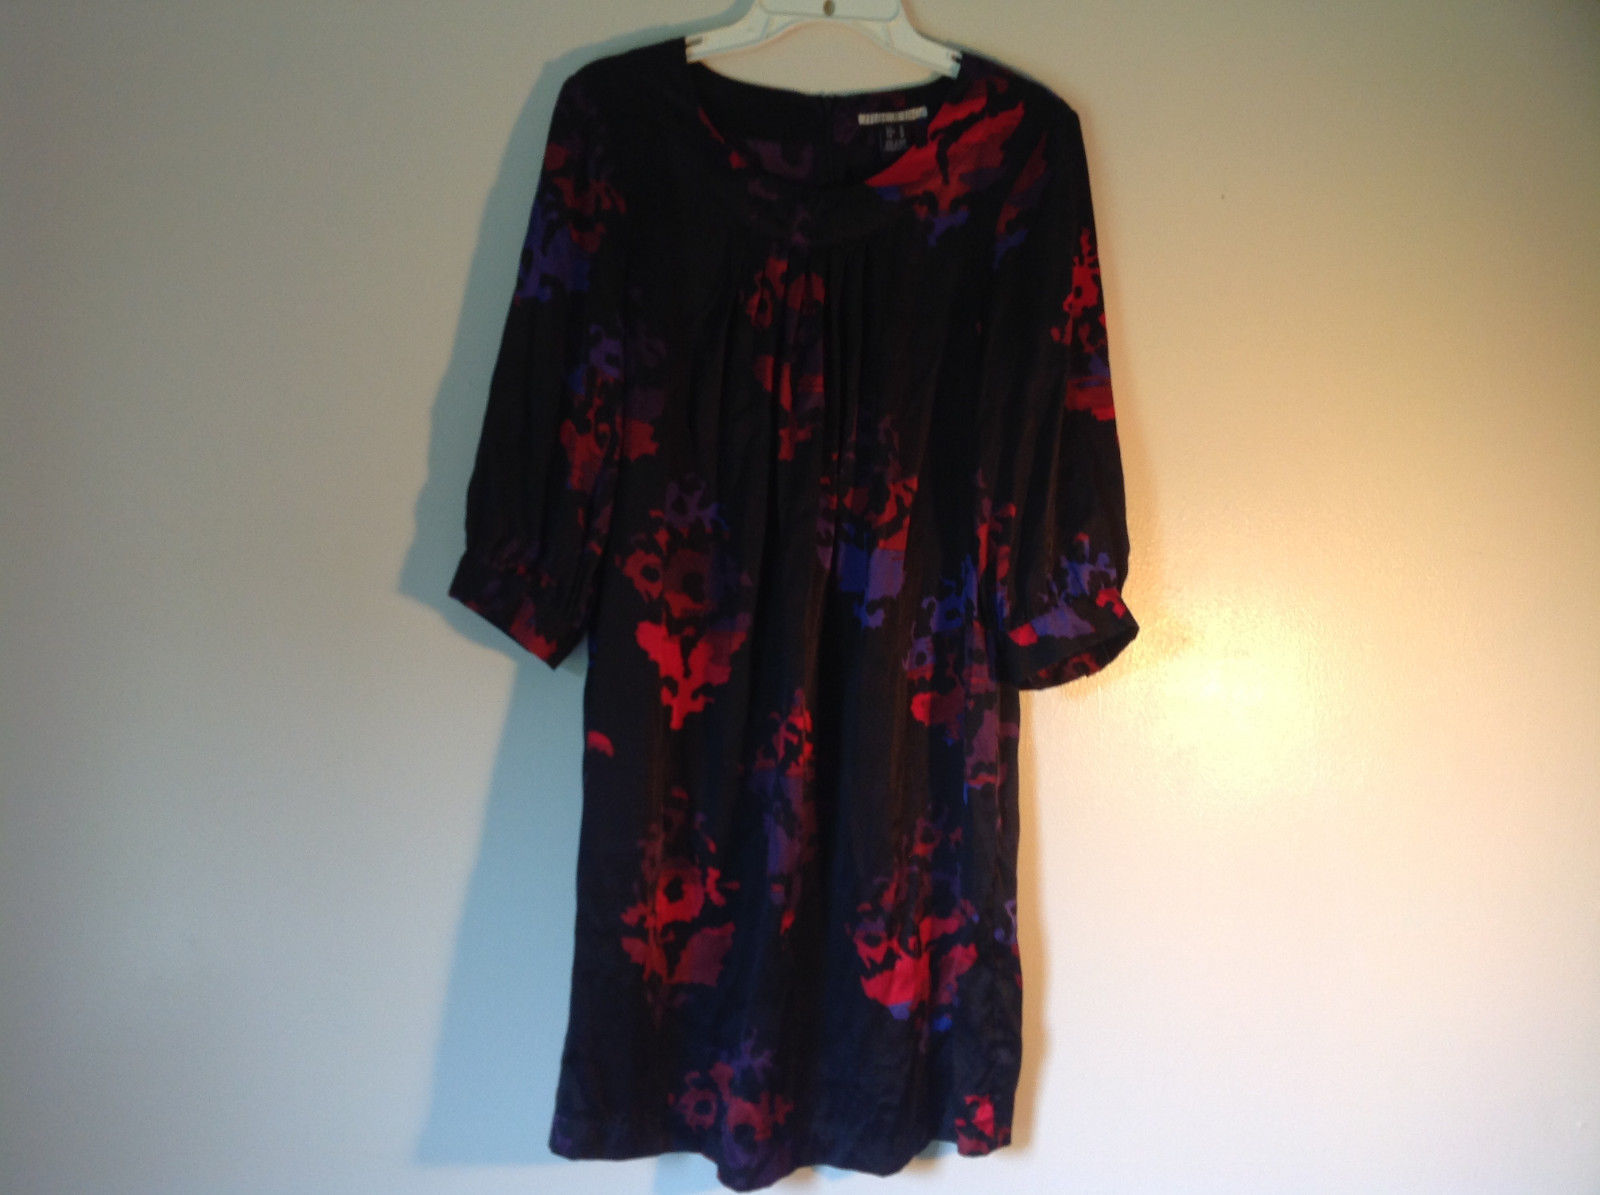 Mac and Jac Black Flowered Dress Size Medium Three Quarter Length Sleeves